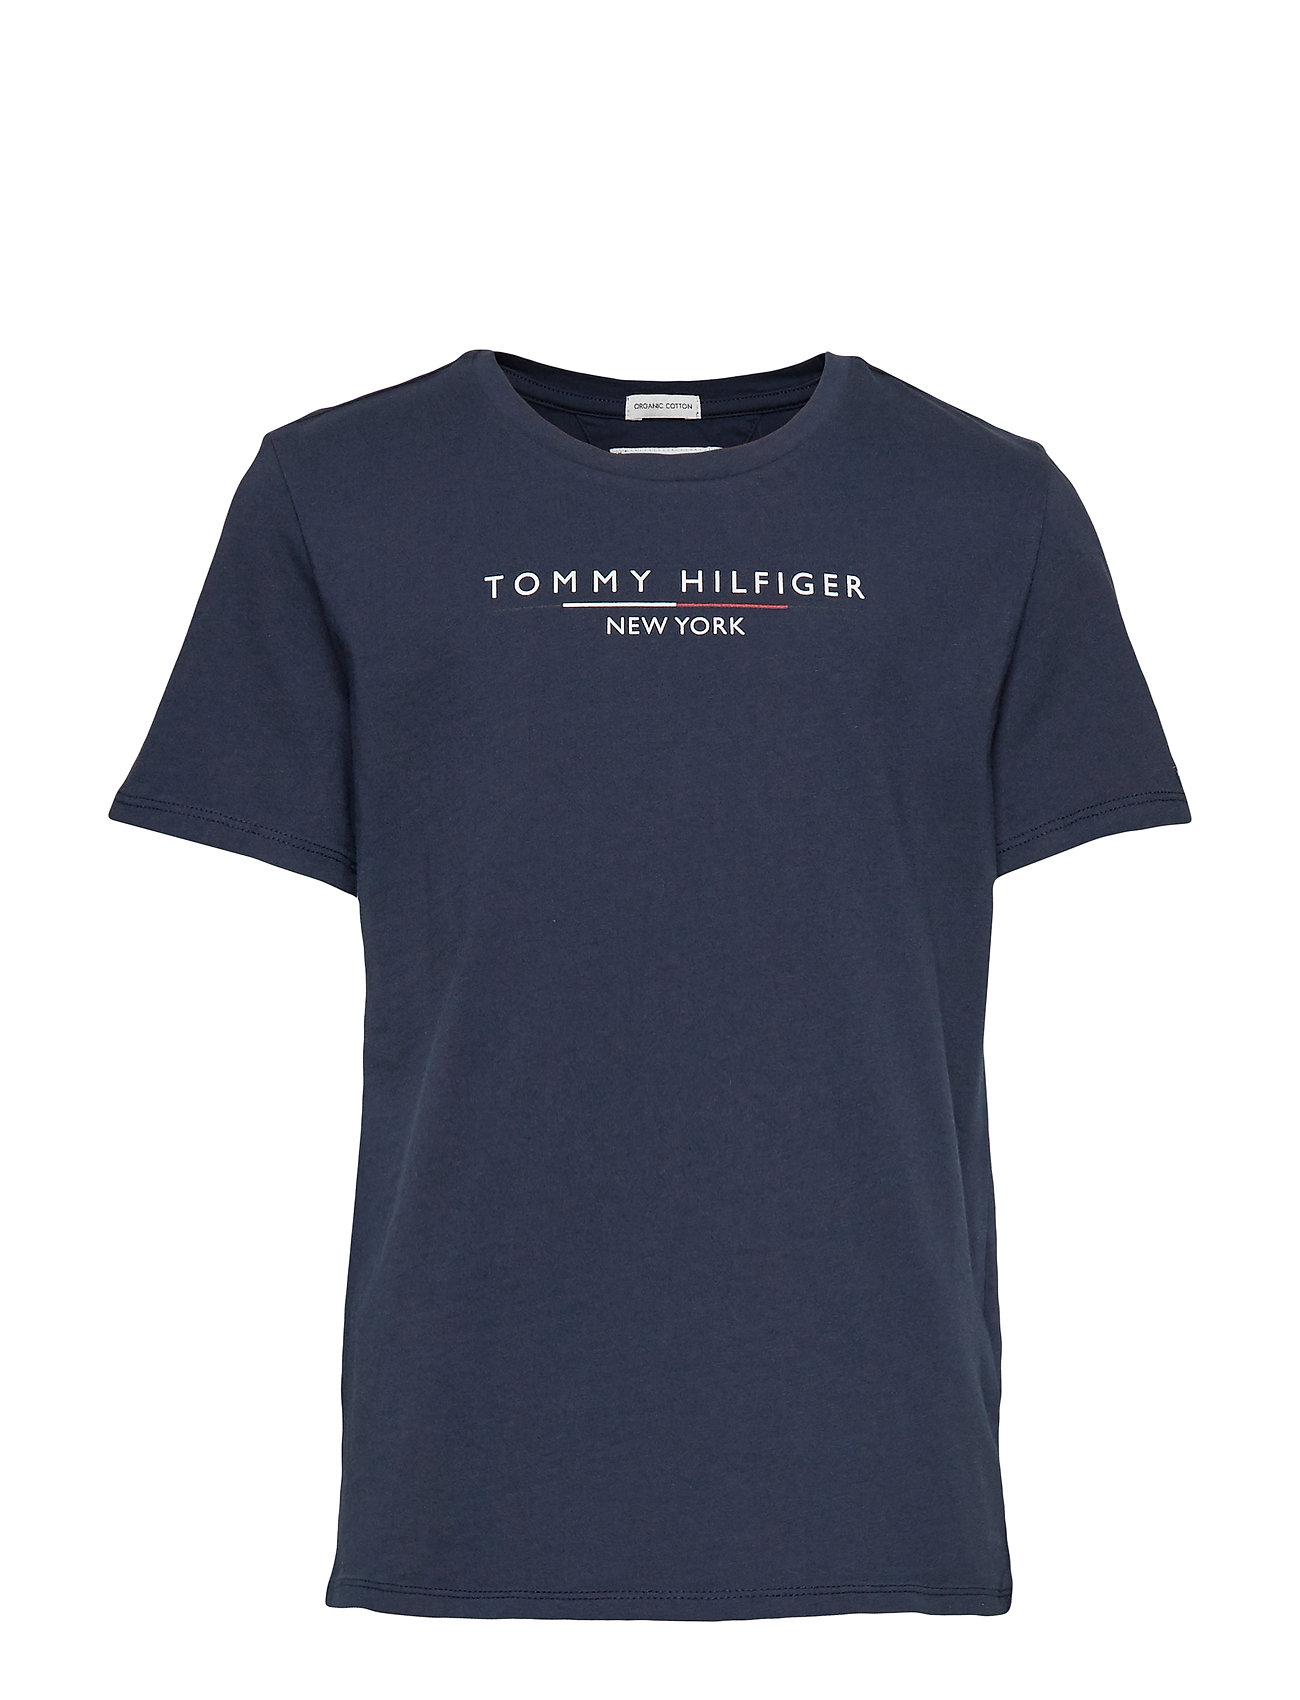 Tommy Hilfiger ESSENTIAL HILFIGER T - BLACK IRIS